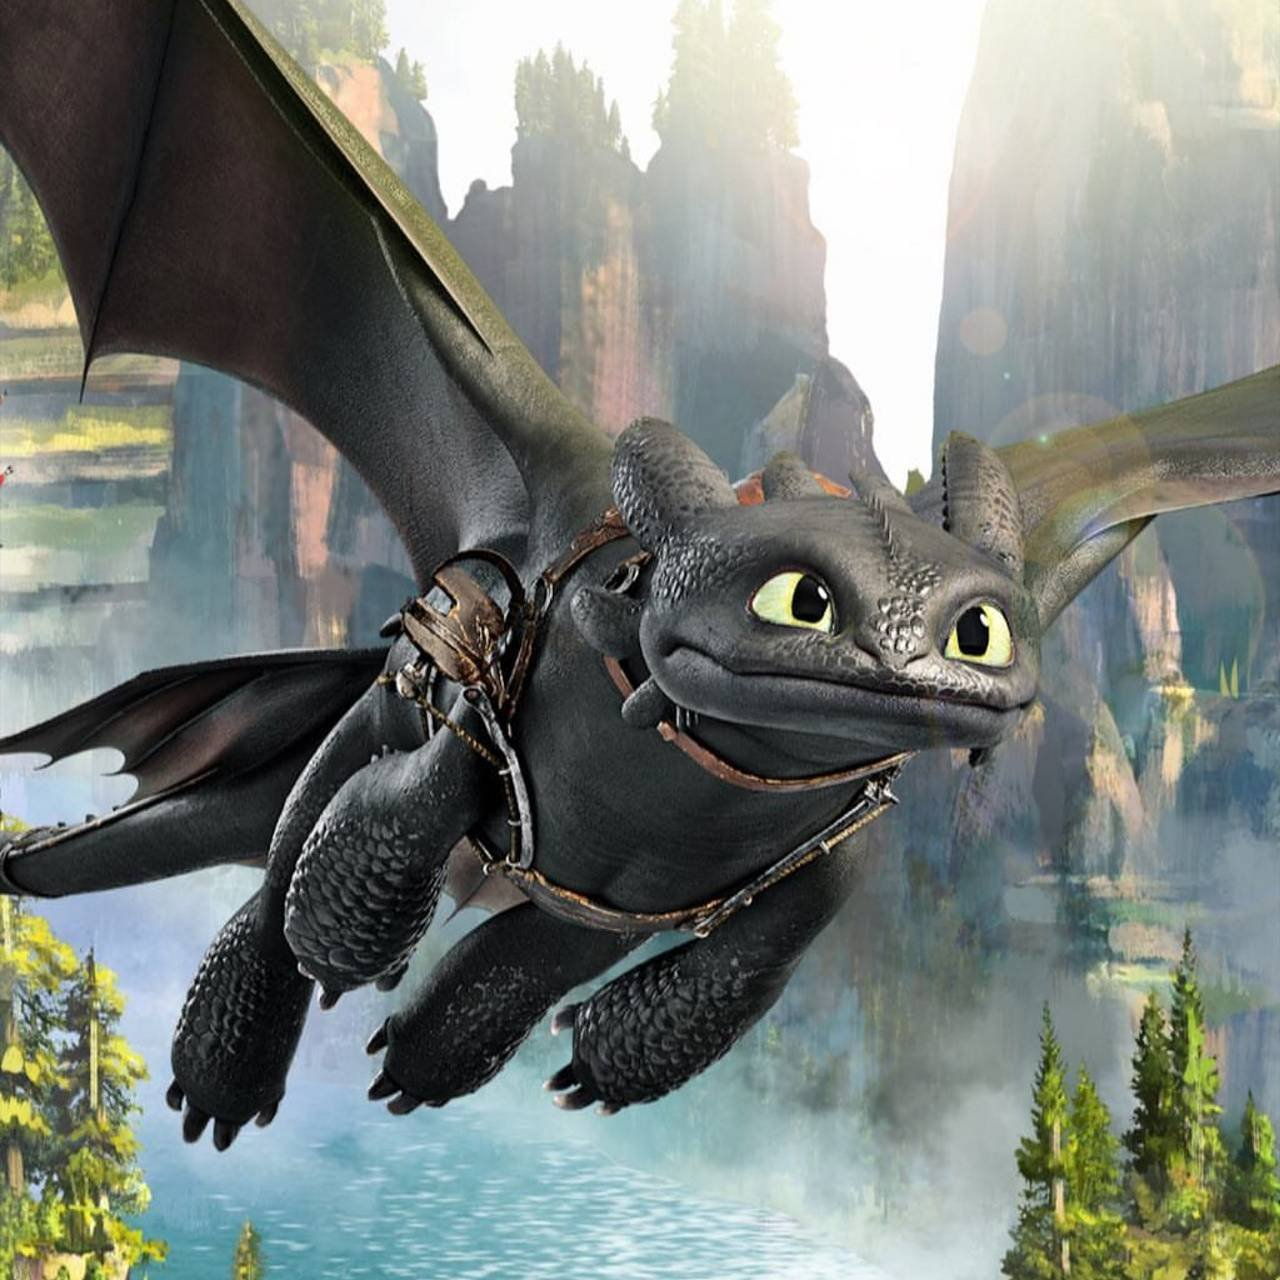 бедолага картинки как приручит дракона потому